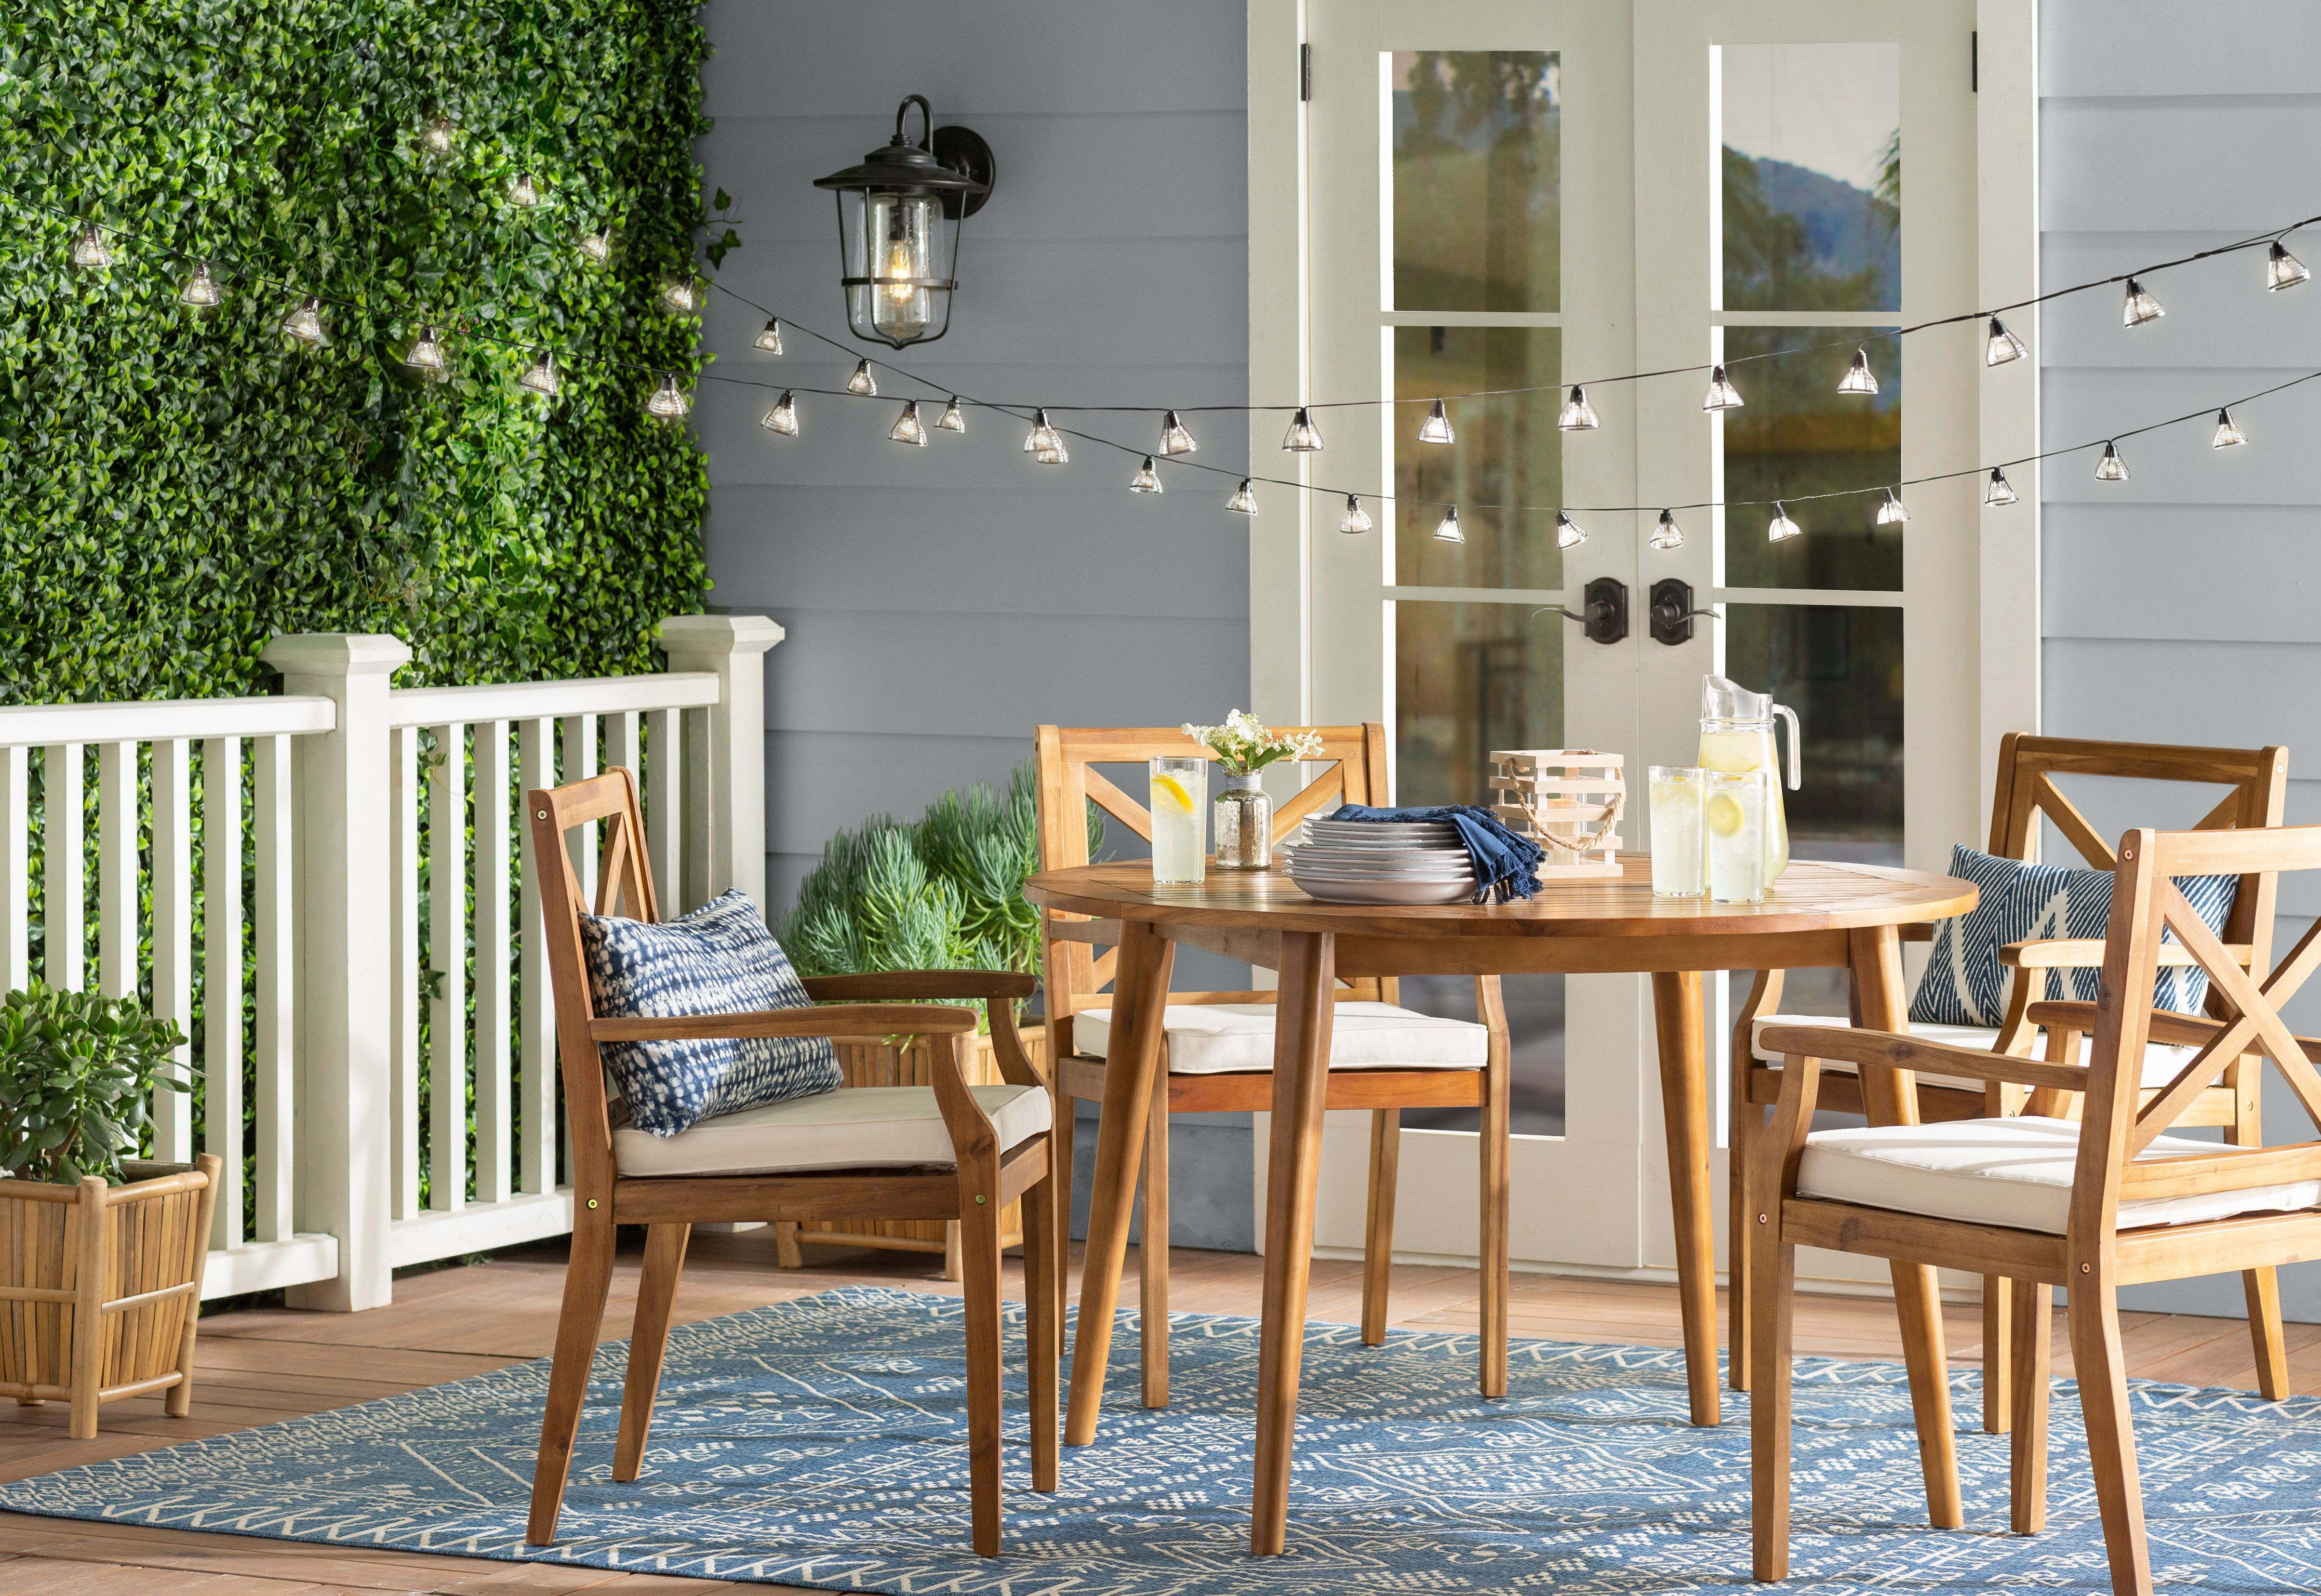 Shop this Sleek & Chic Modern Outdoor Design!   Outdoor ... on Outdoor Living Shop id=86565